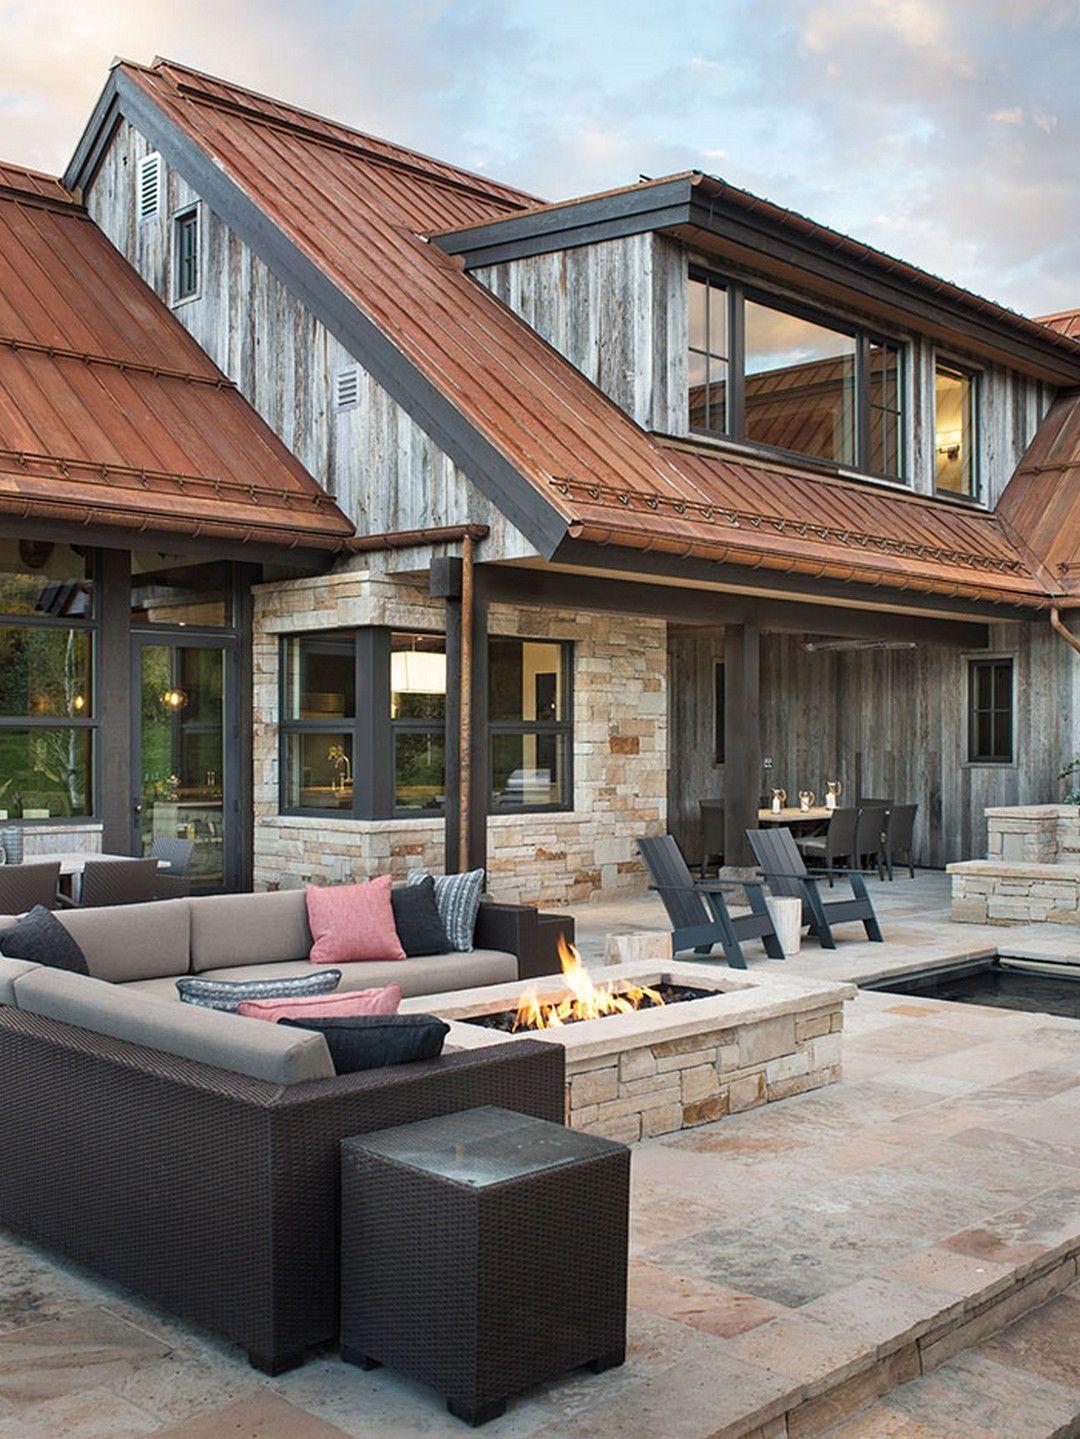 20 Unbelievable Modern Home Exterior Designs: Amazing Rustic Mountain Farmhouse Decorating Ideas